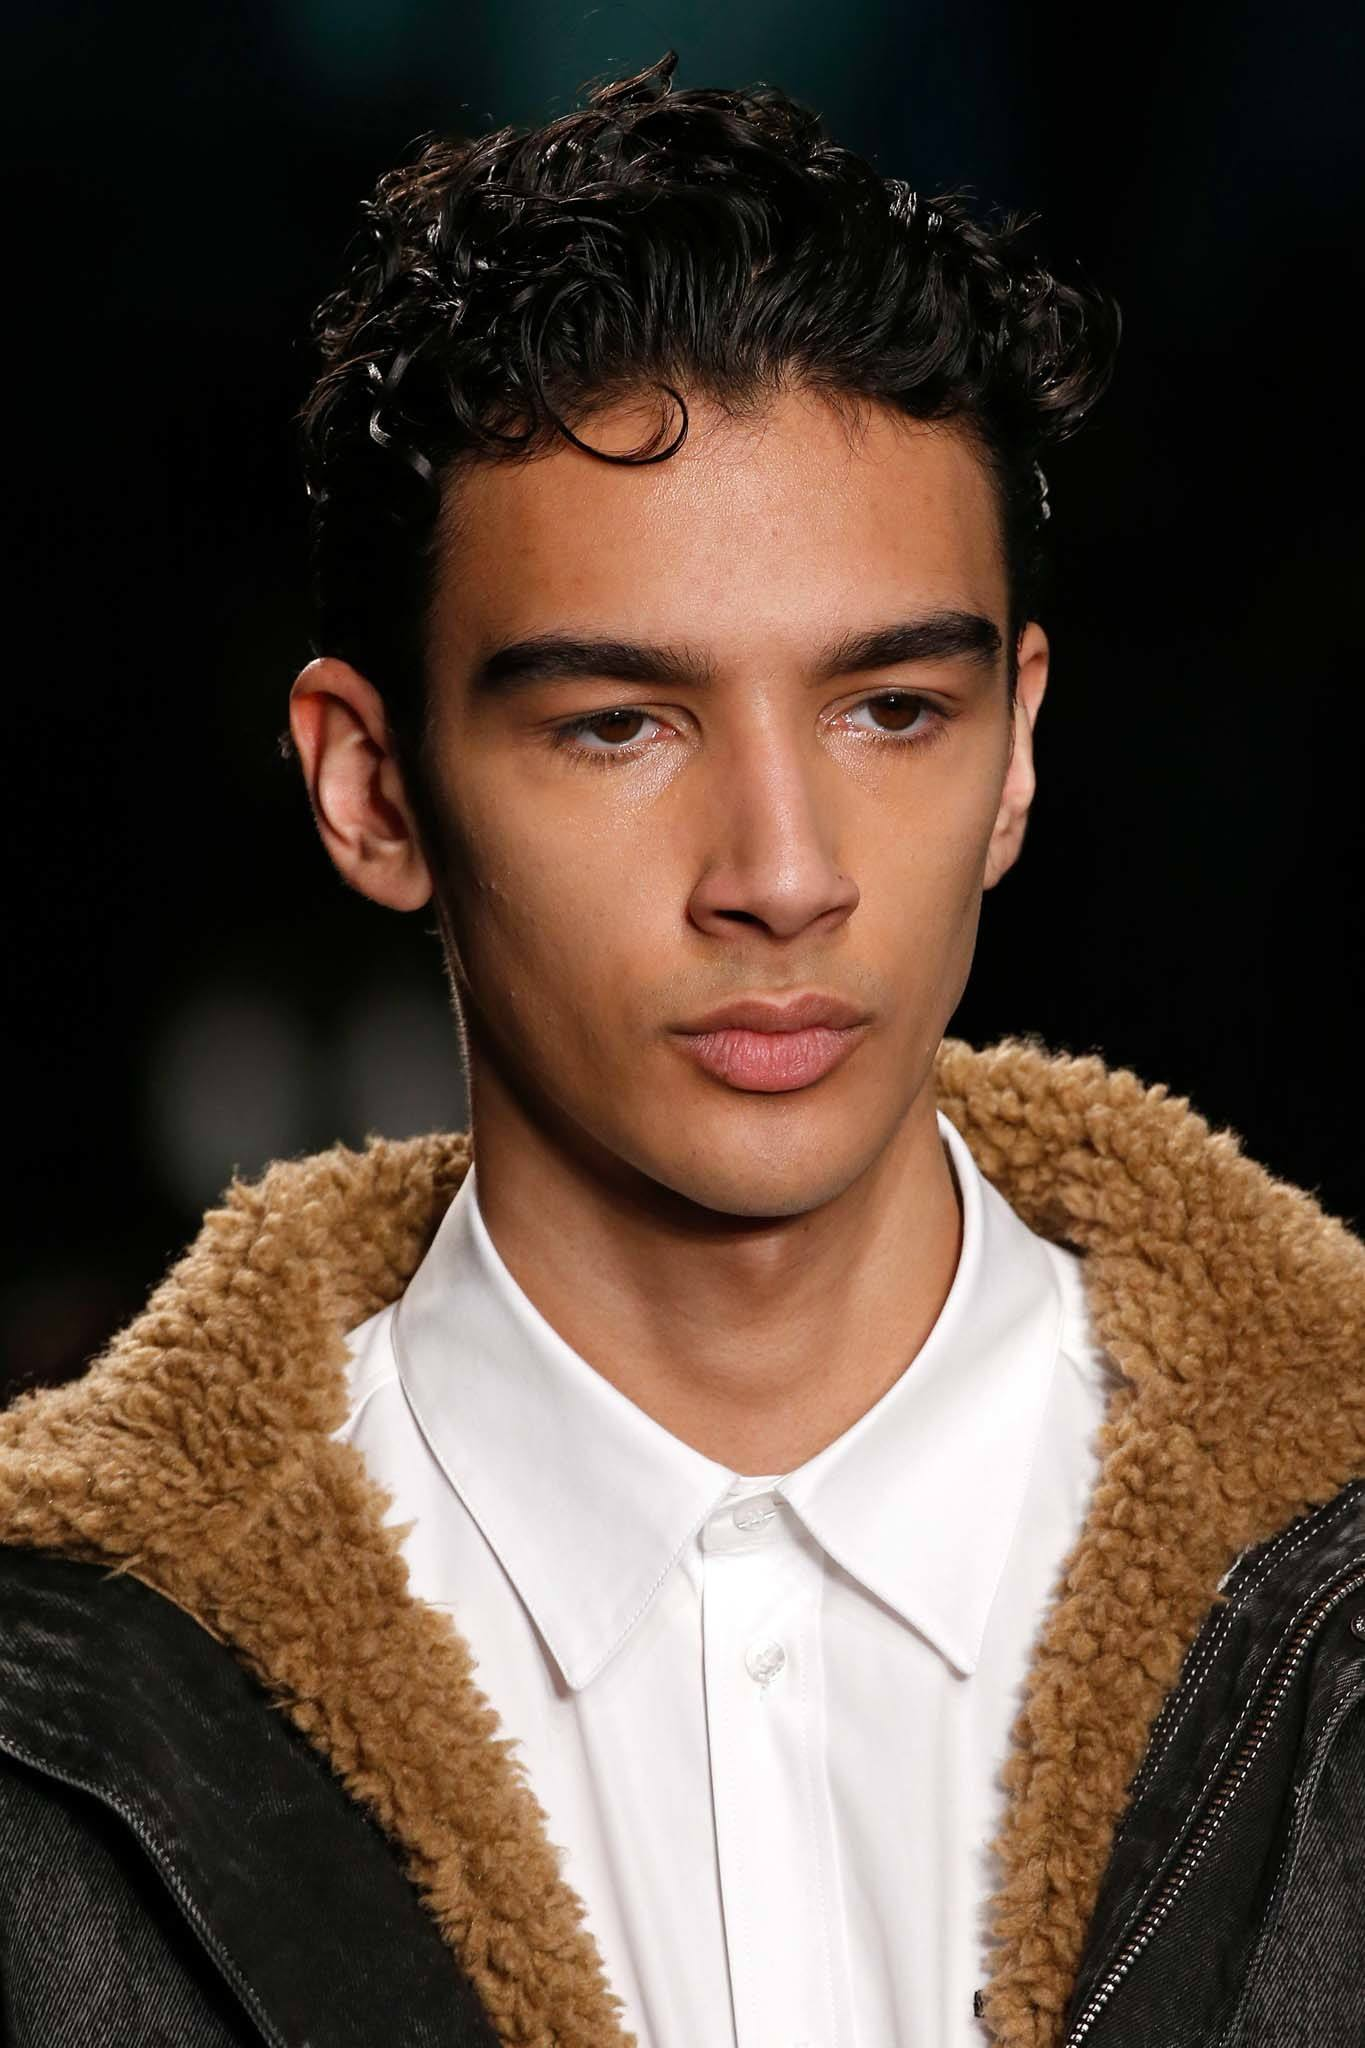 Milan Fashion Week Men's AW19: Runway shot of a male model with dark brown gelled curly hair, wearing a shearling jacket